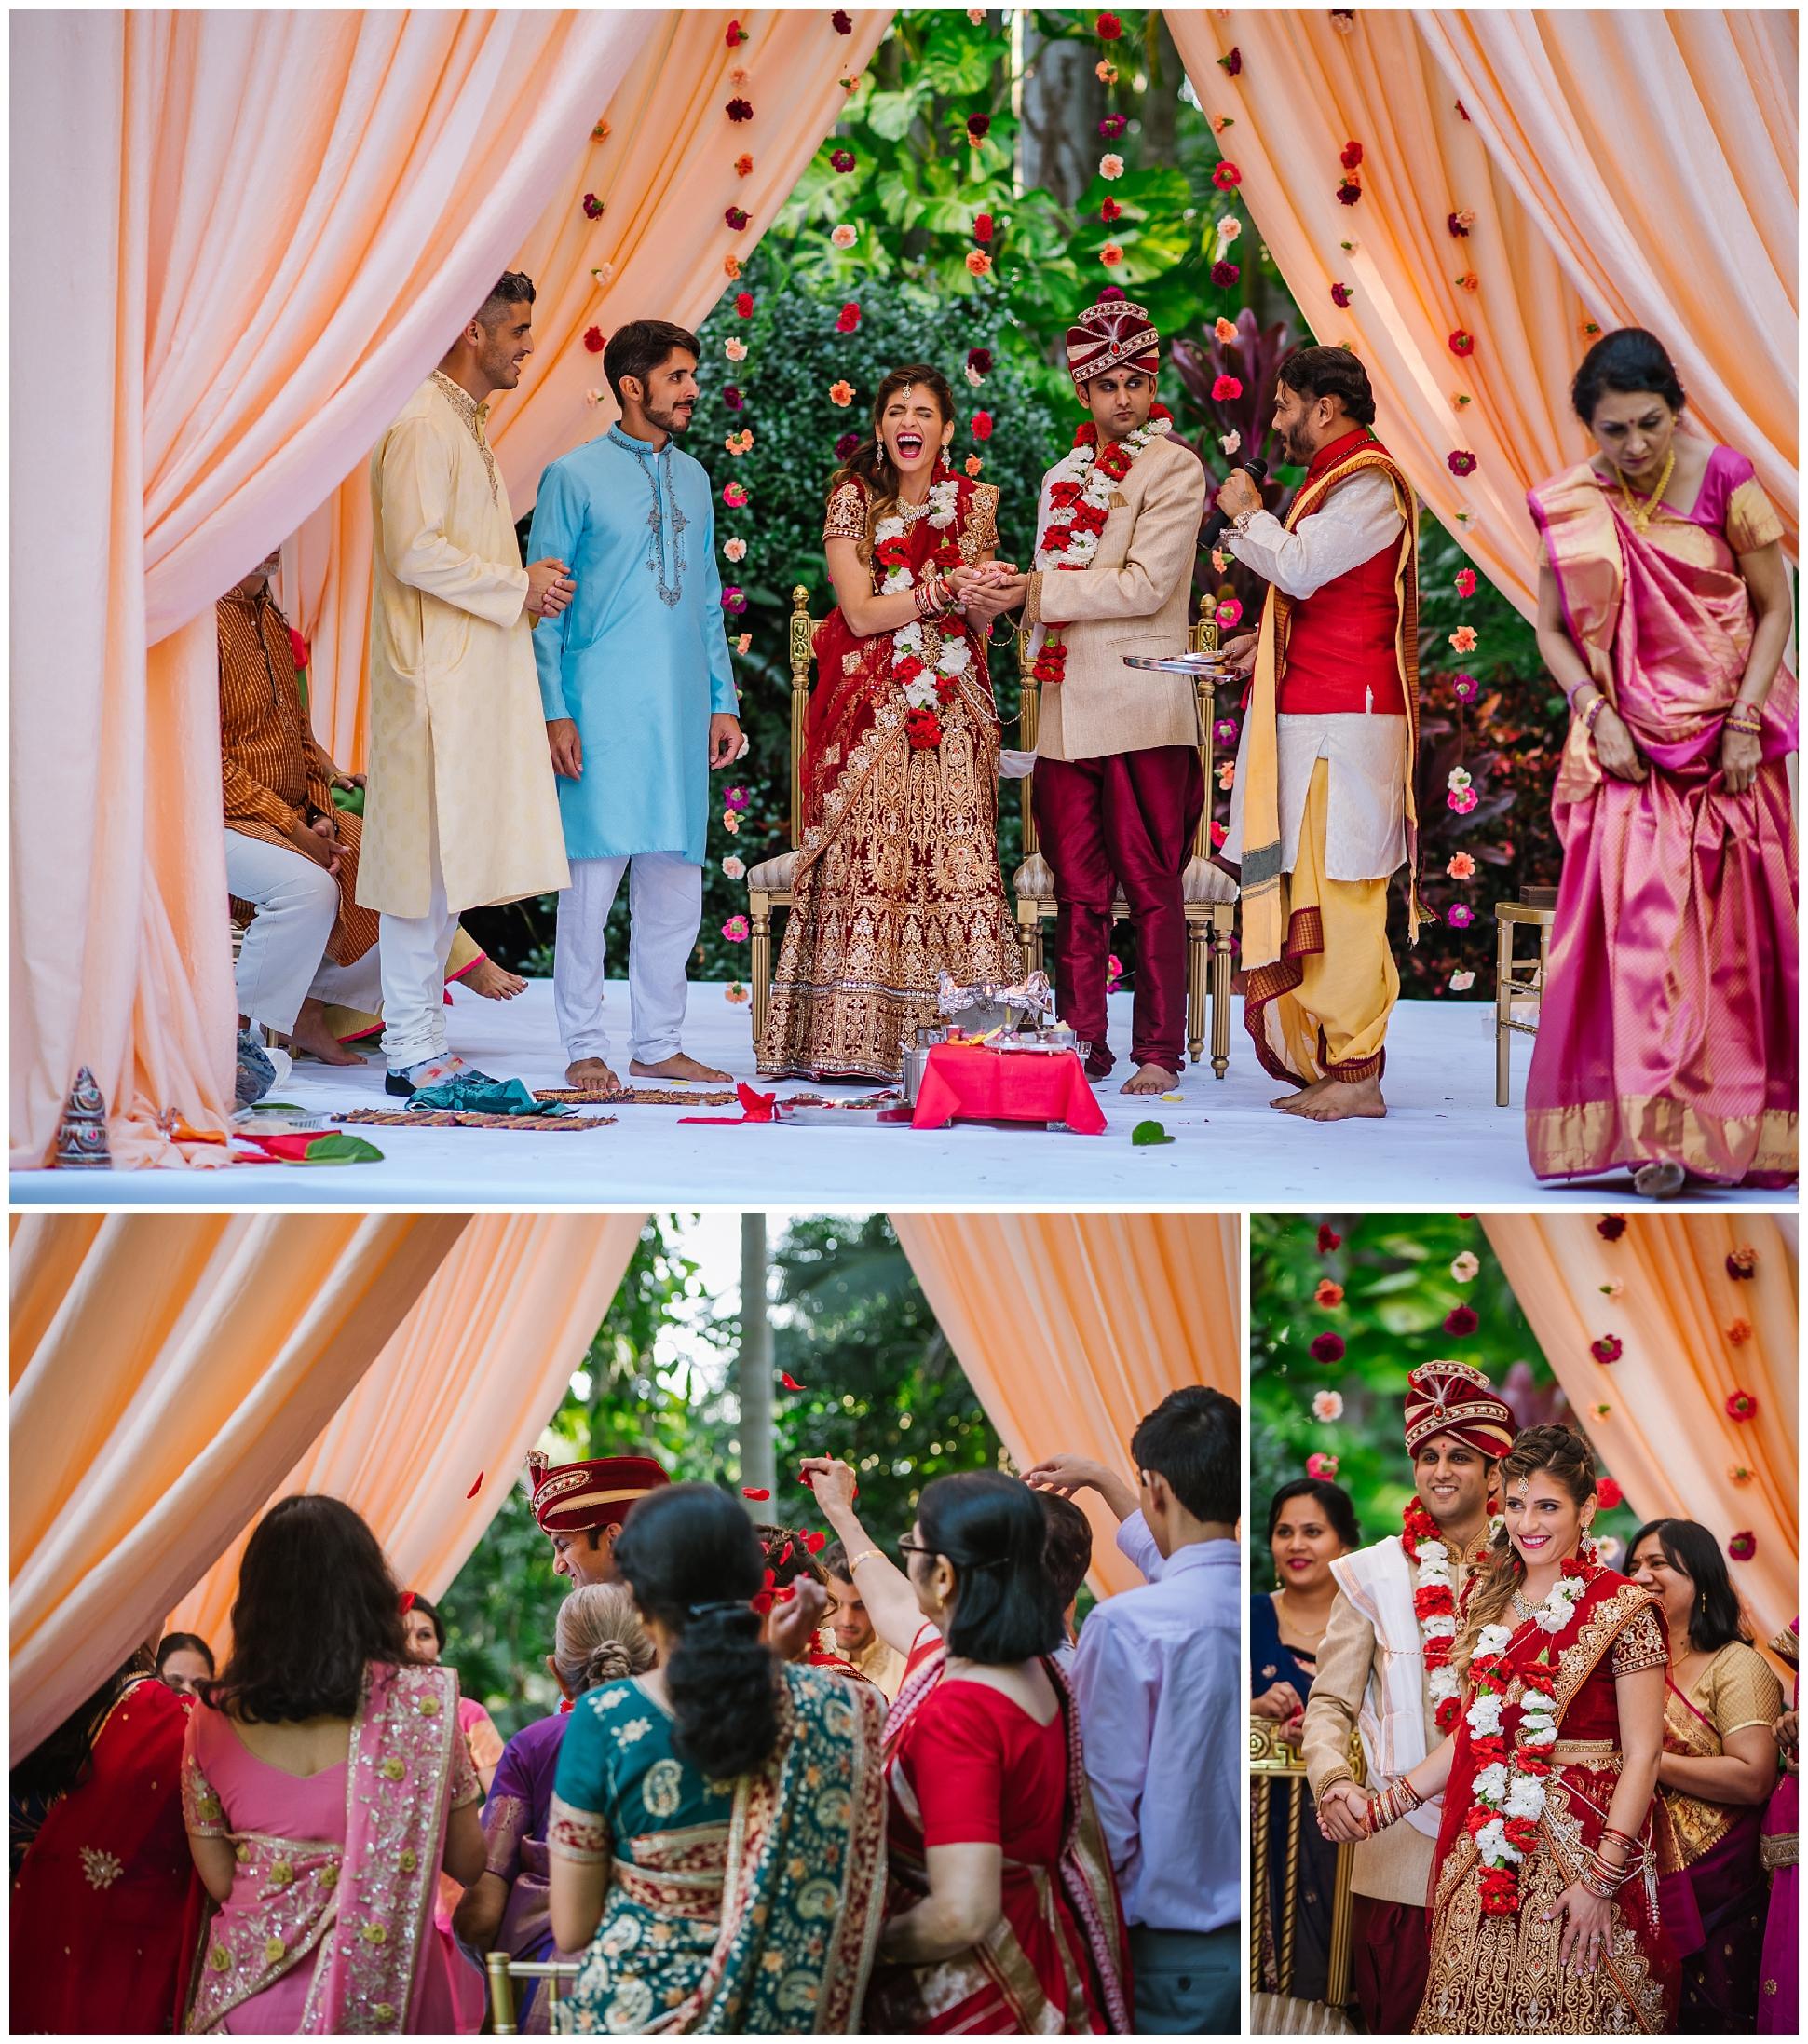 St-pete-indian-wedding-photographer-barat-sunken-gardens_0118.jpg